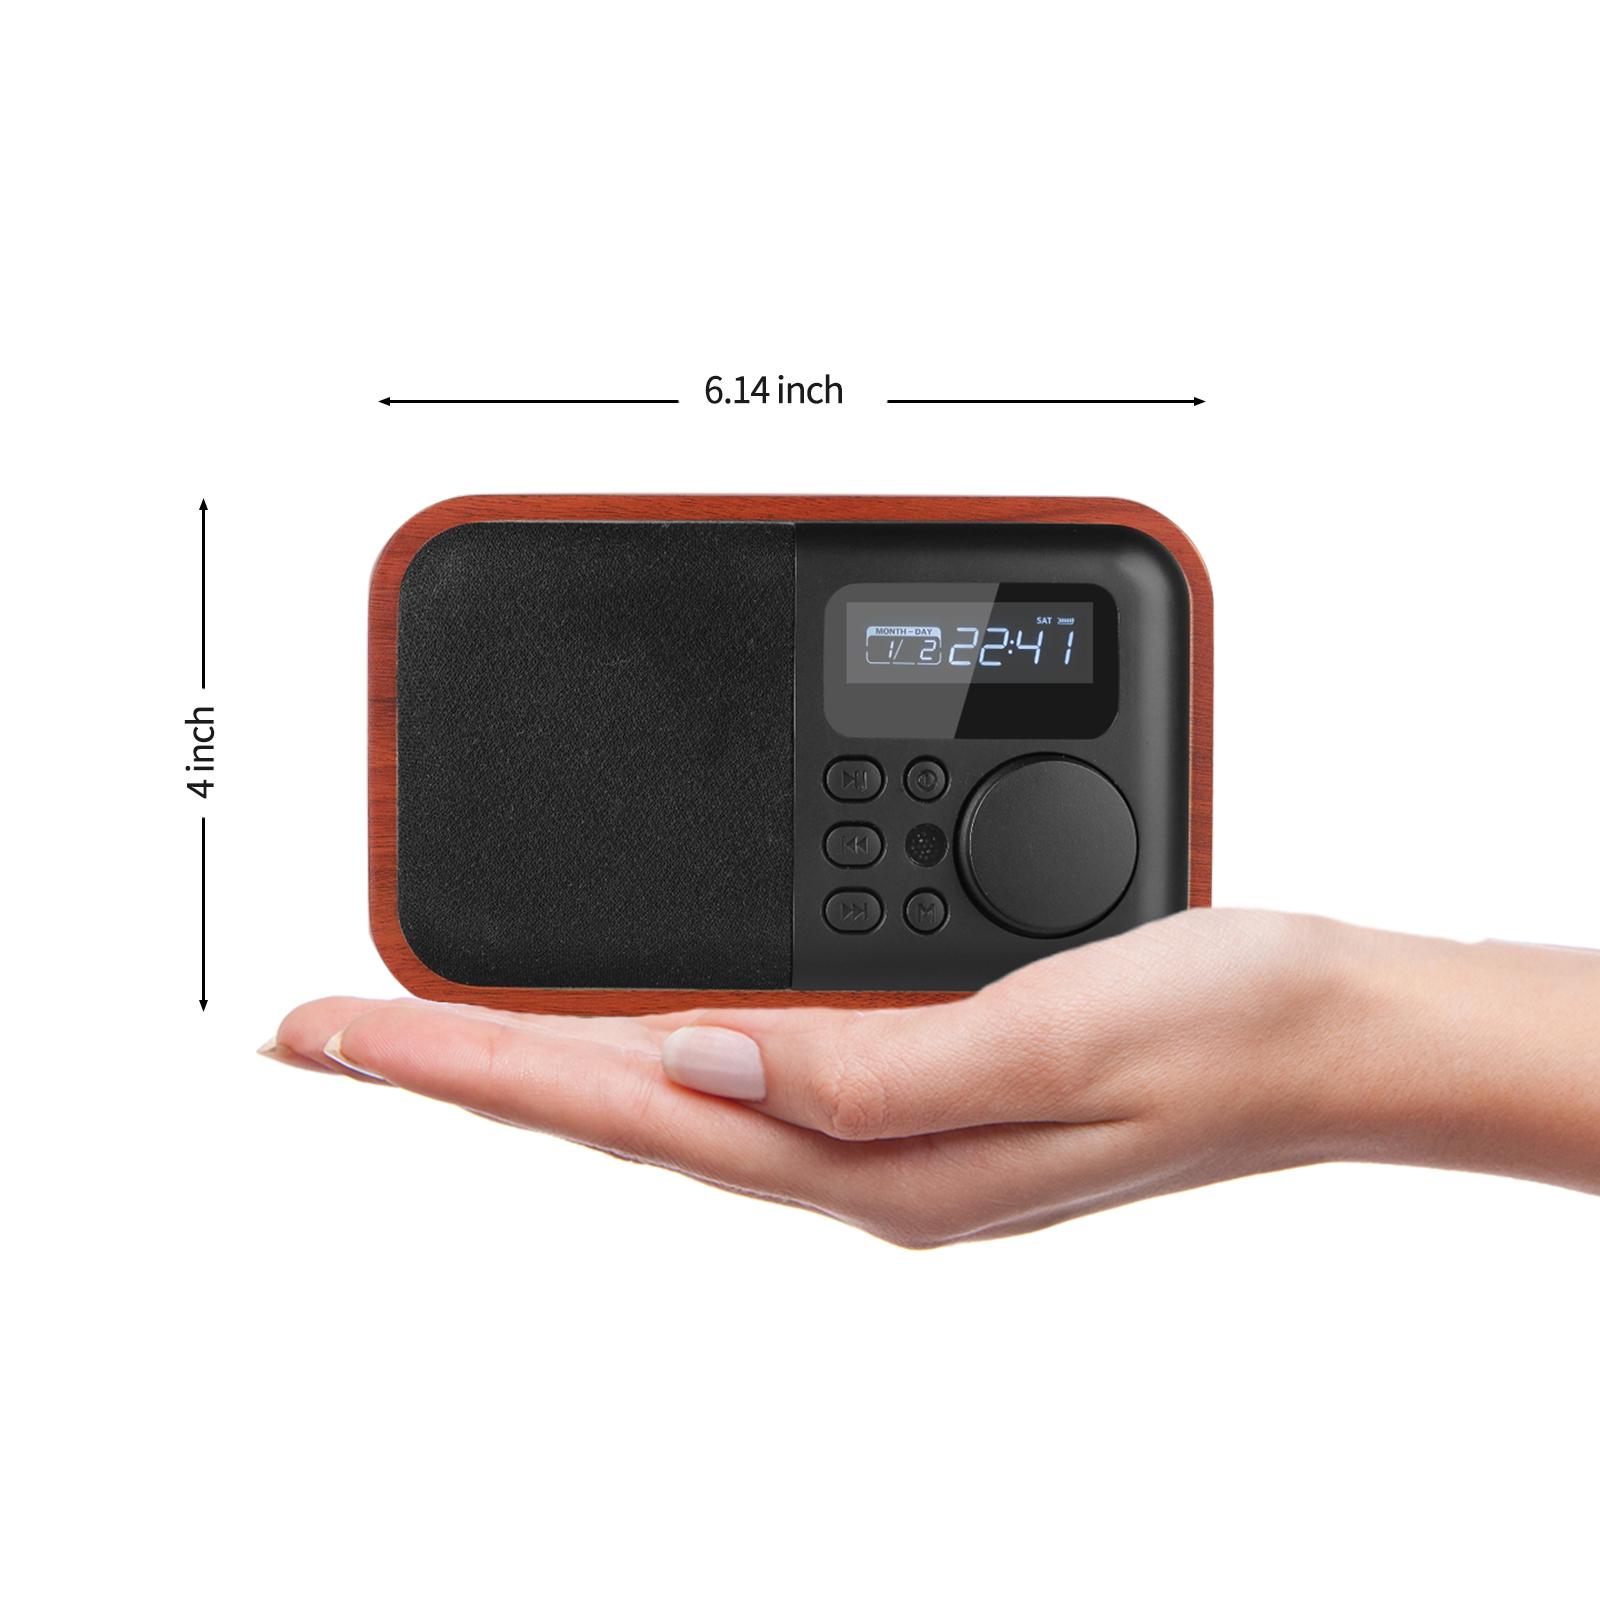 Radio: Wooden Digital Speaker Bluetooth FM Radio With Alarm Clock